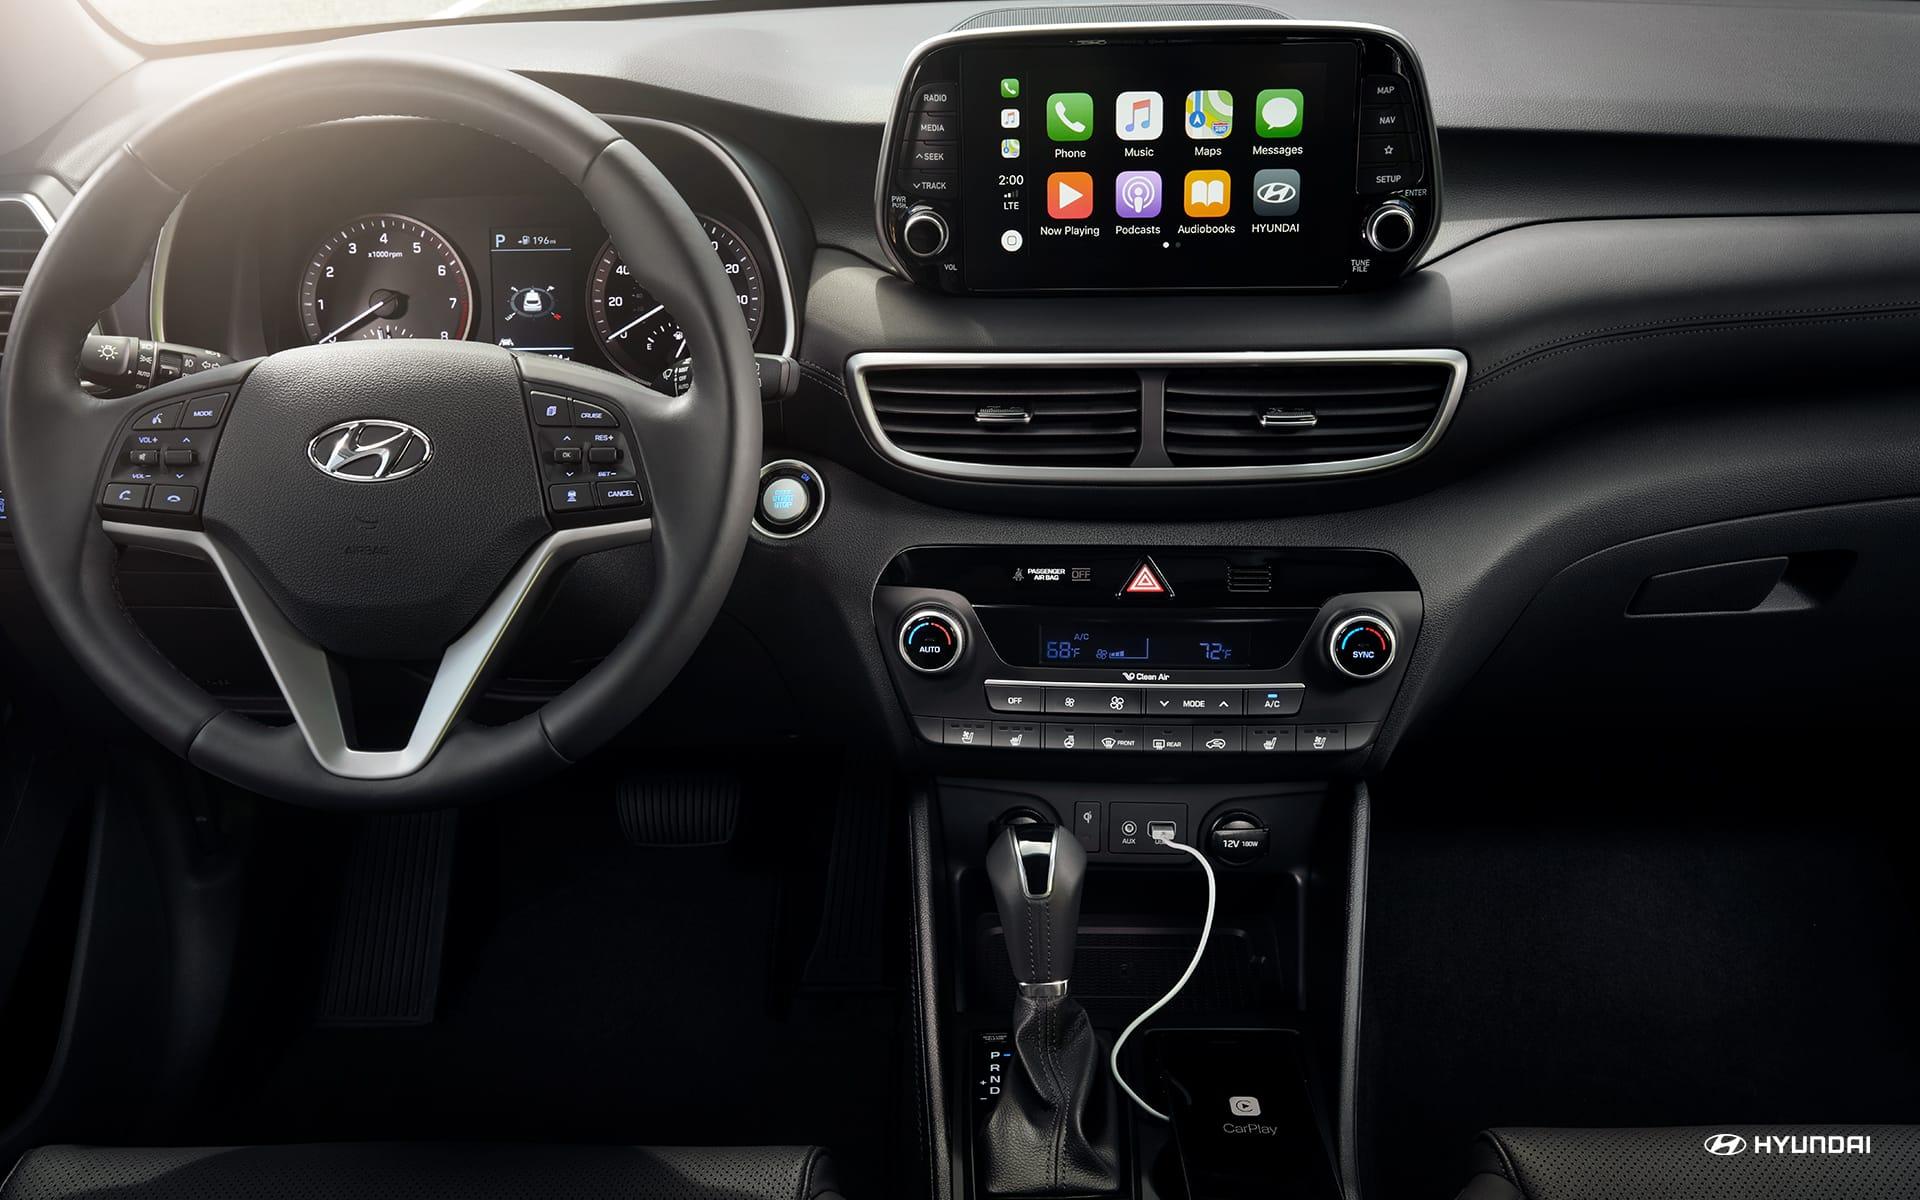 Apple CarPlay™ in the 2019 Hyundai Tucson